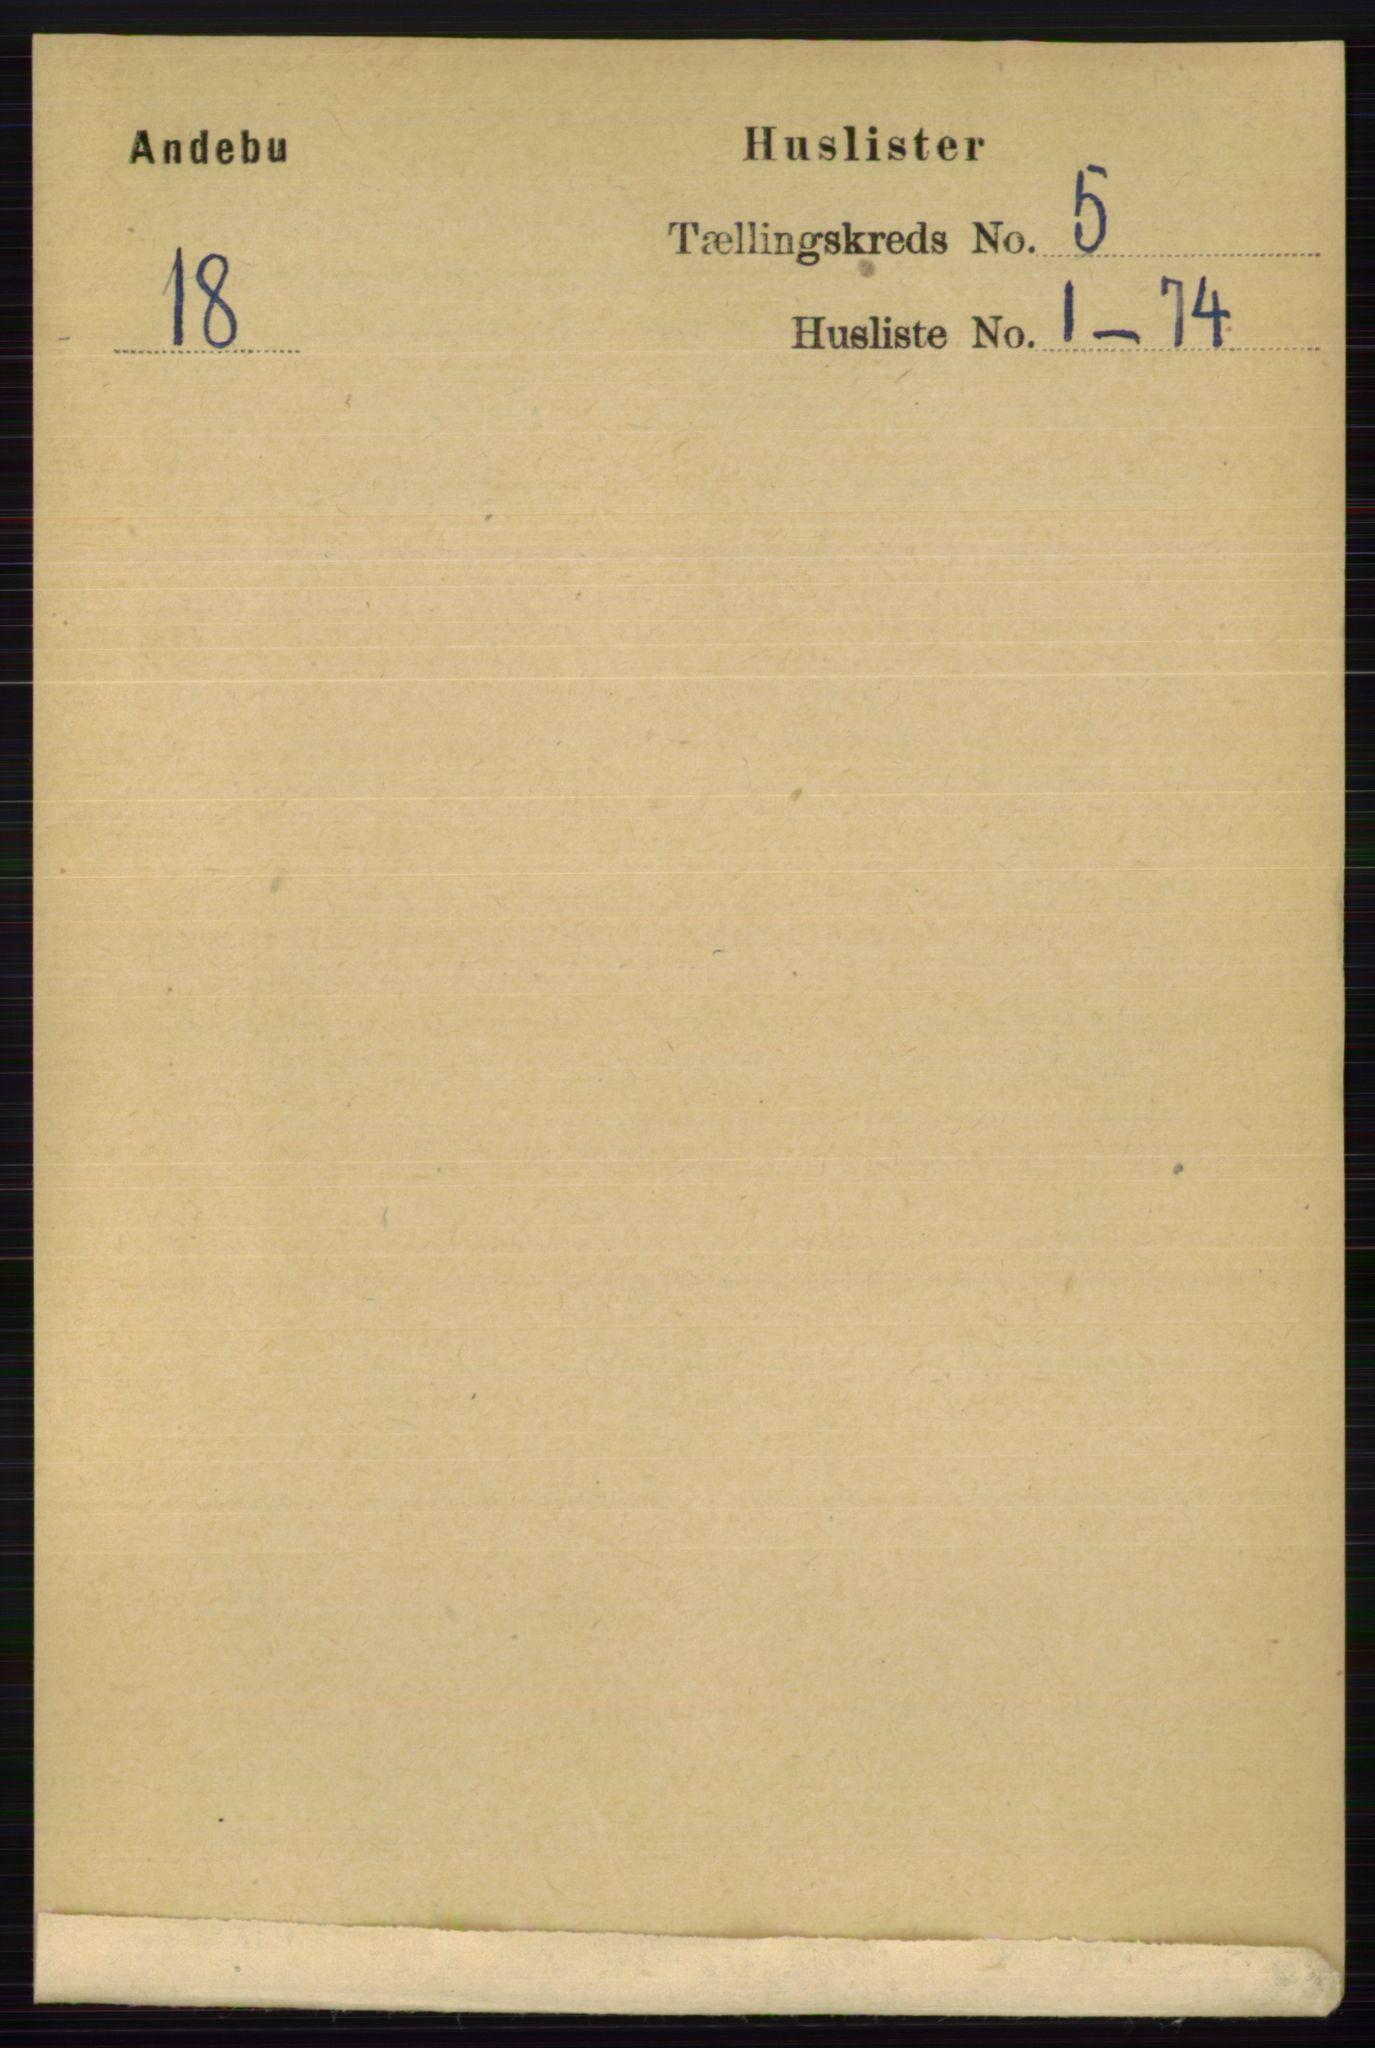 RA, Folketelling 1891 for 0719 Andebu herred, 1891, s. 2577